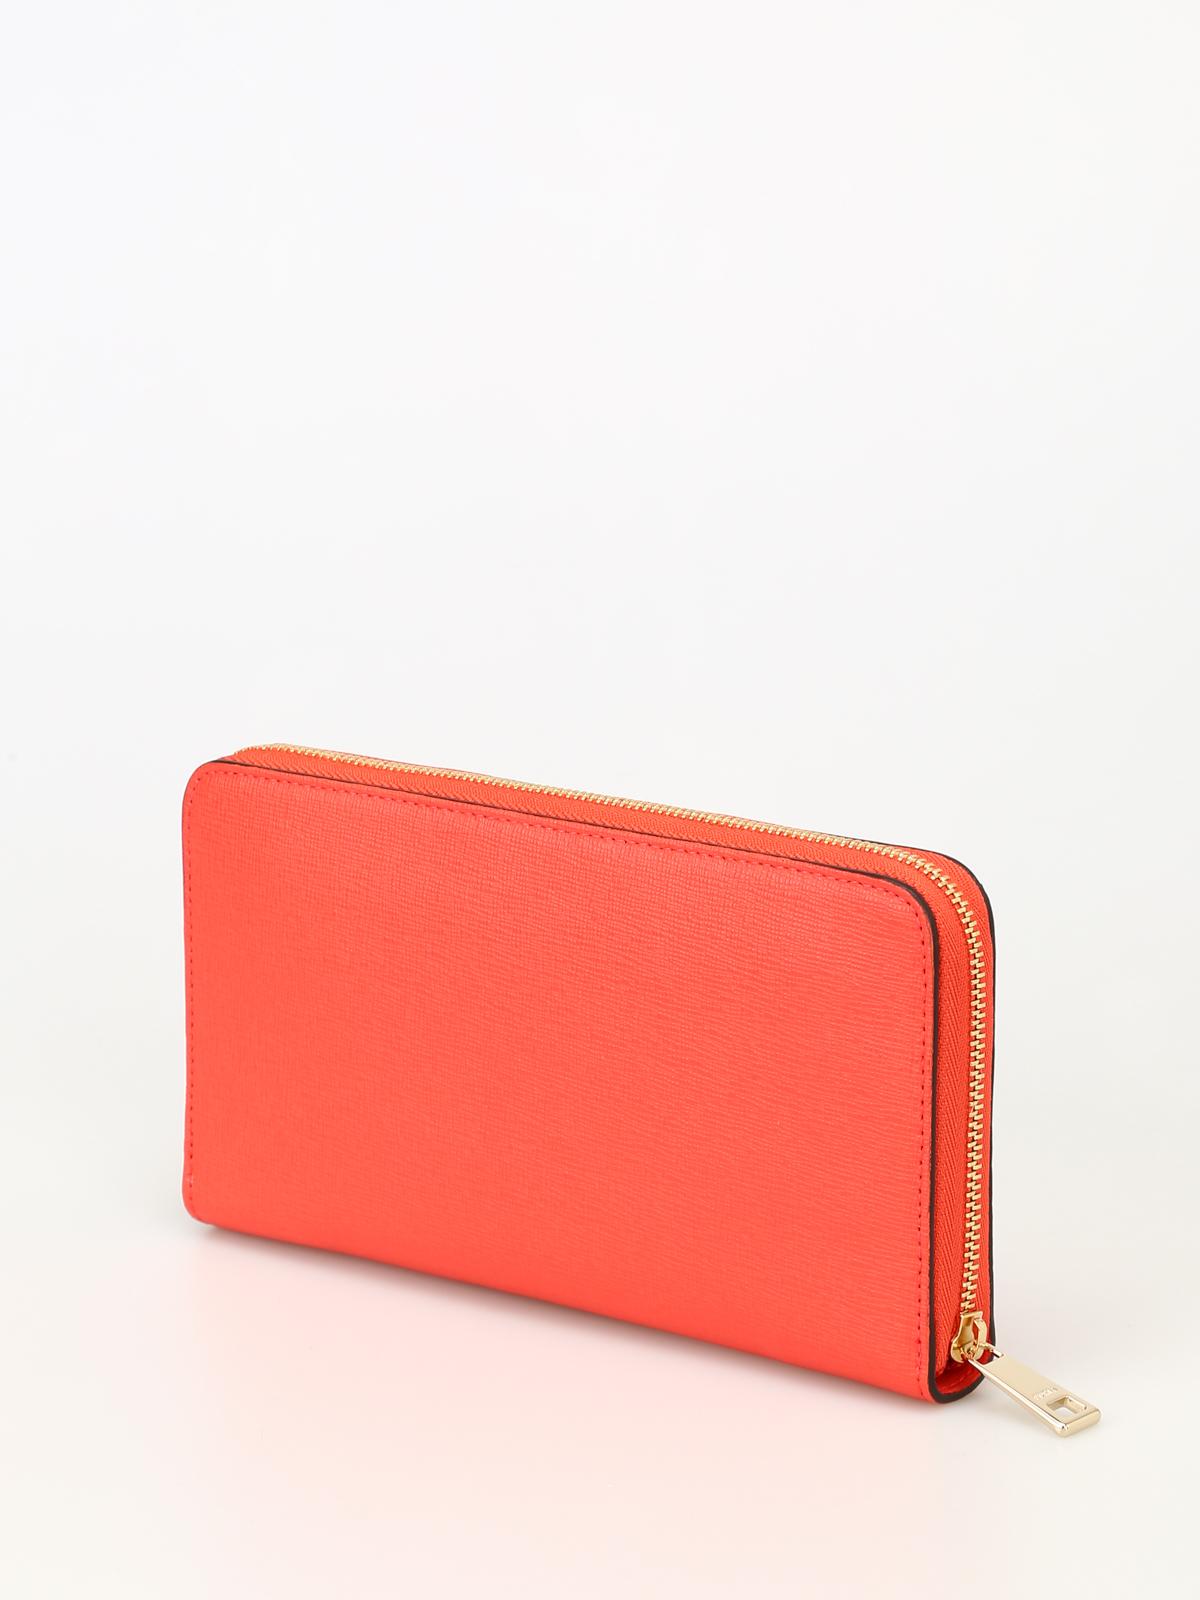 24702f6f40 Furla - Portafoglio rosso Babylon XL - portafogli - 942774 MANGO